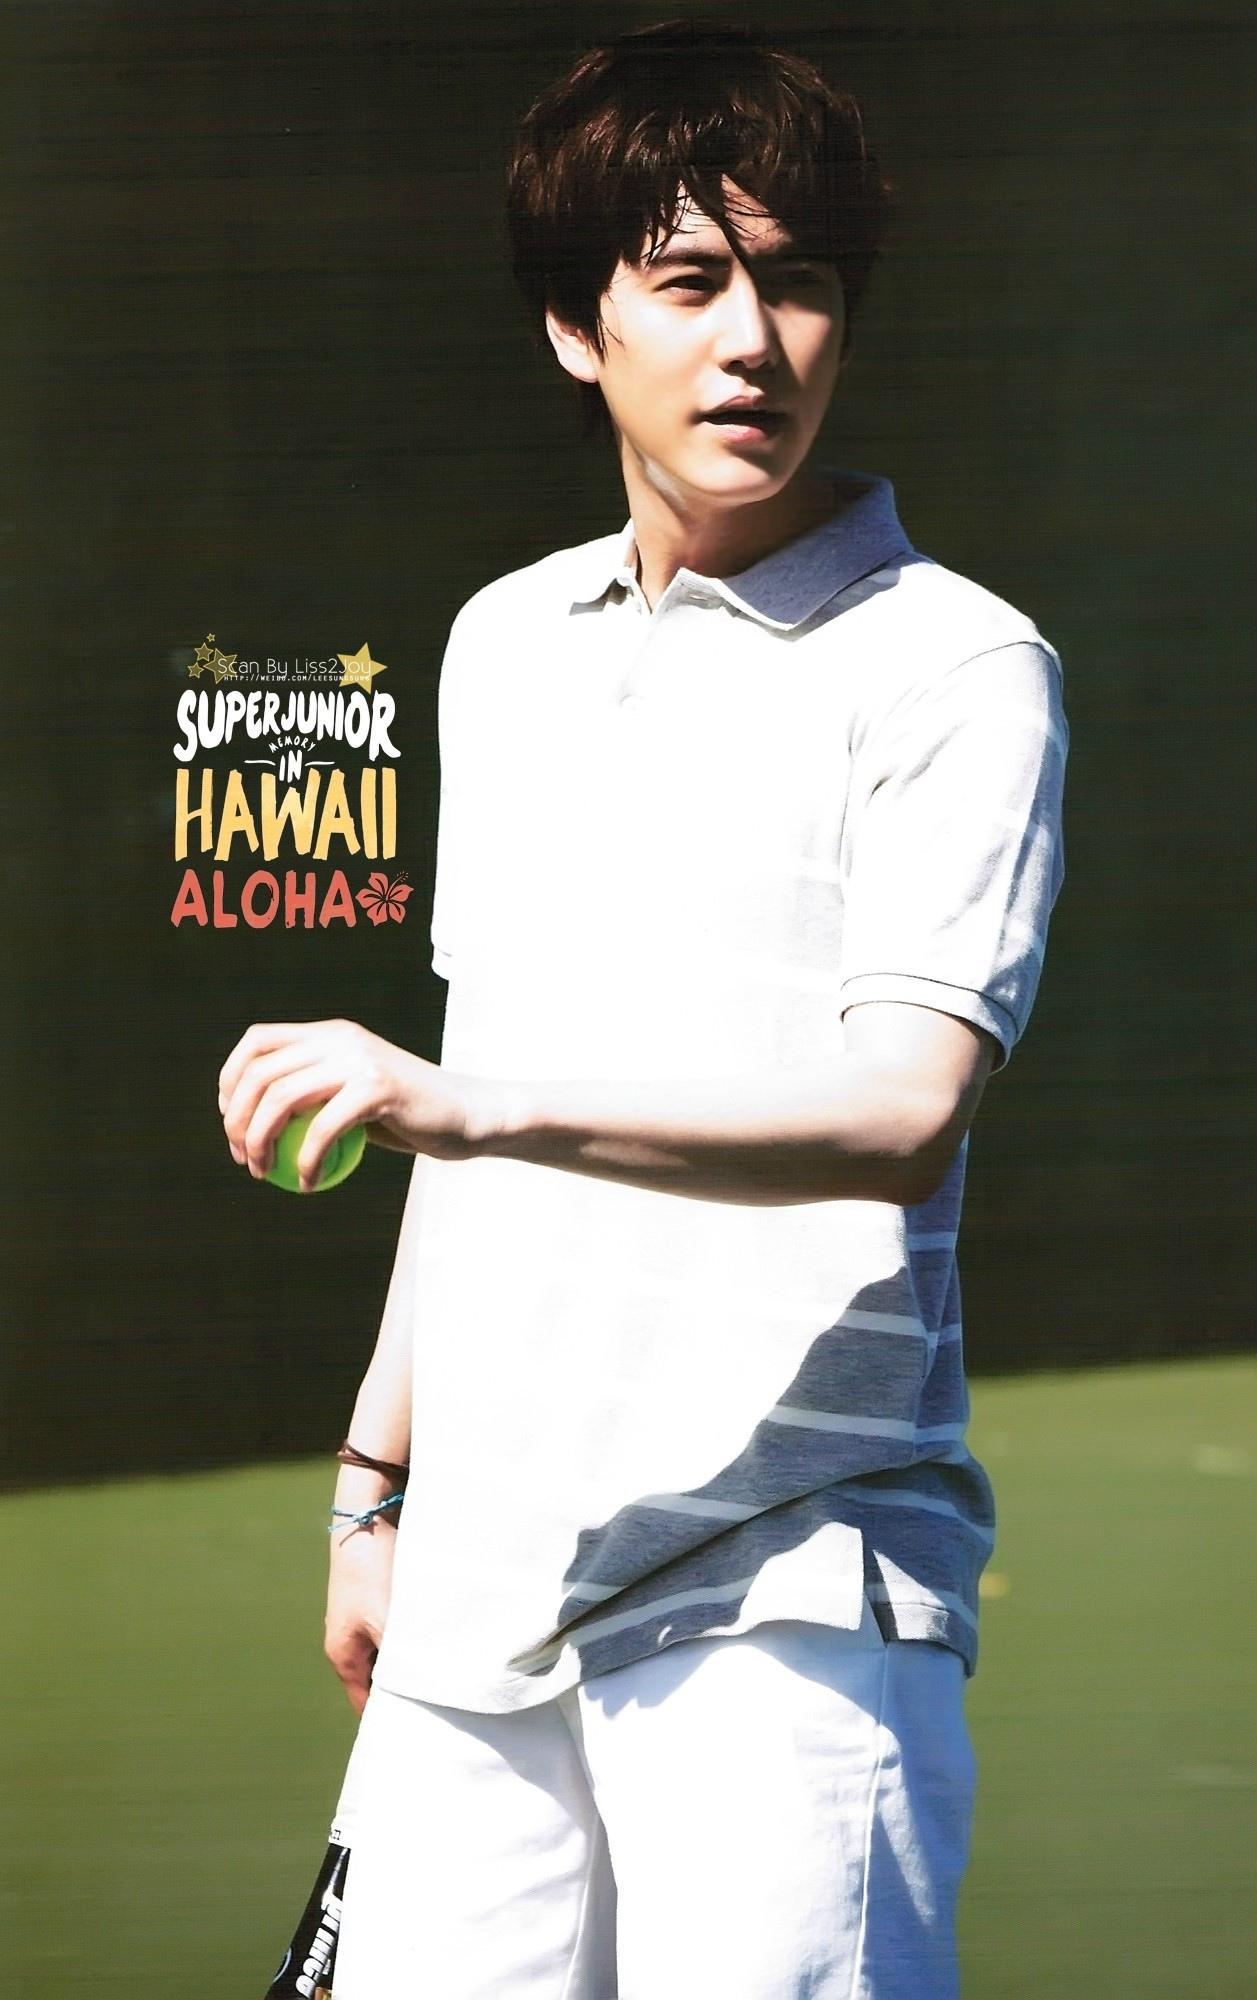 SJ MEMORY IN HAWAII ALOHA (6)